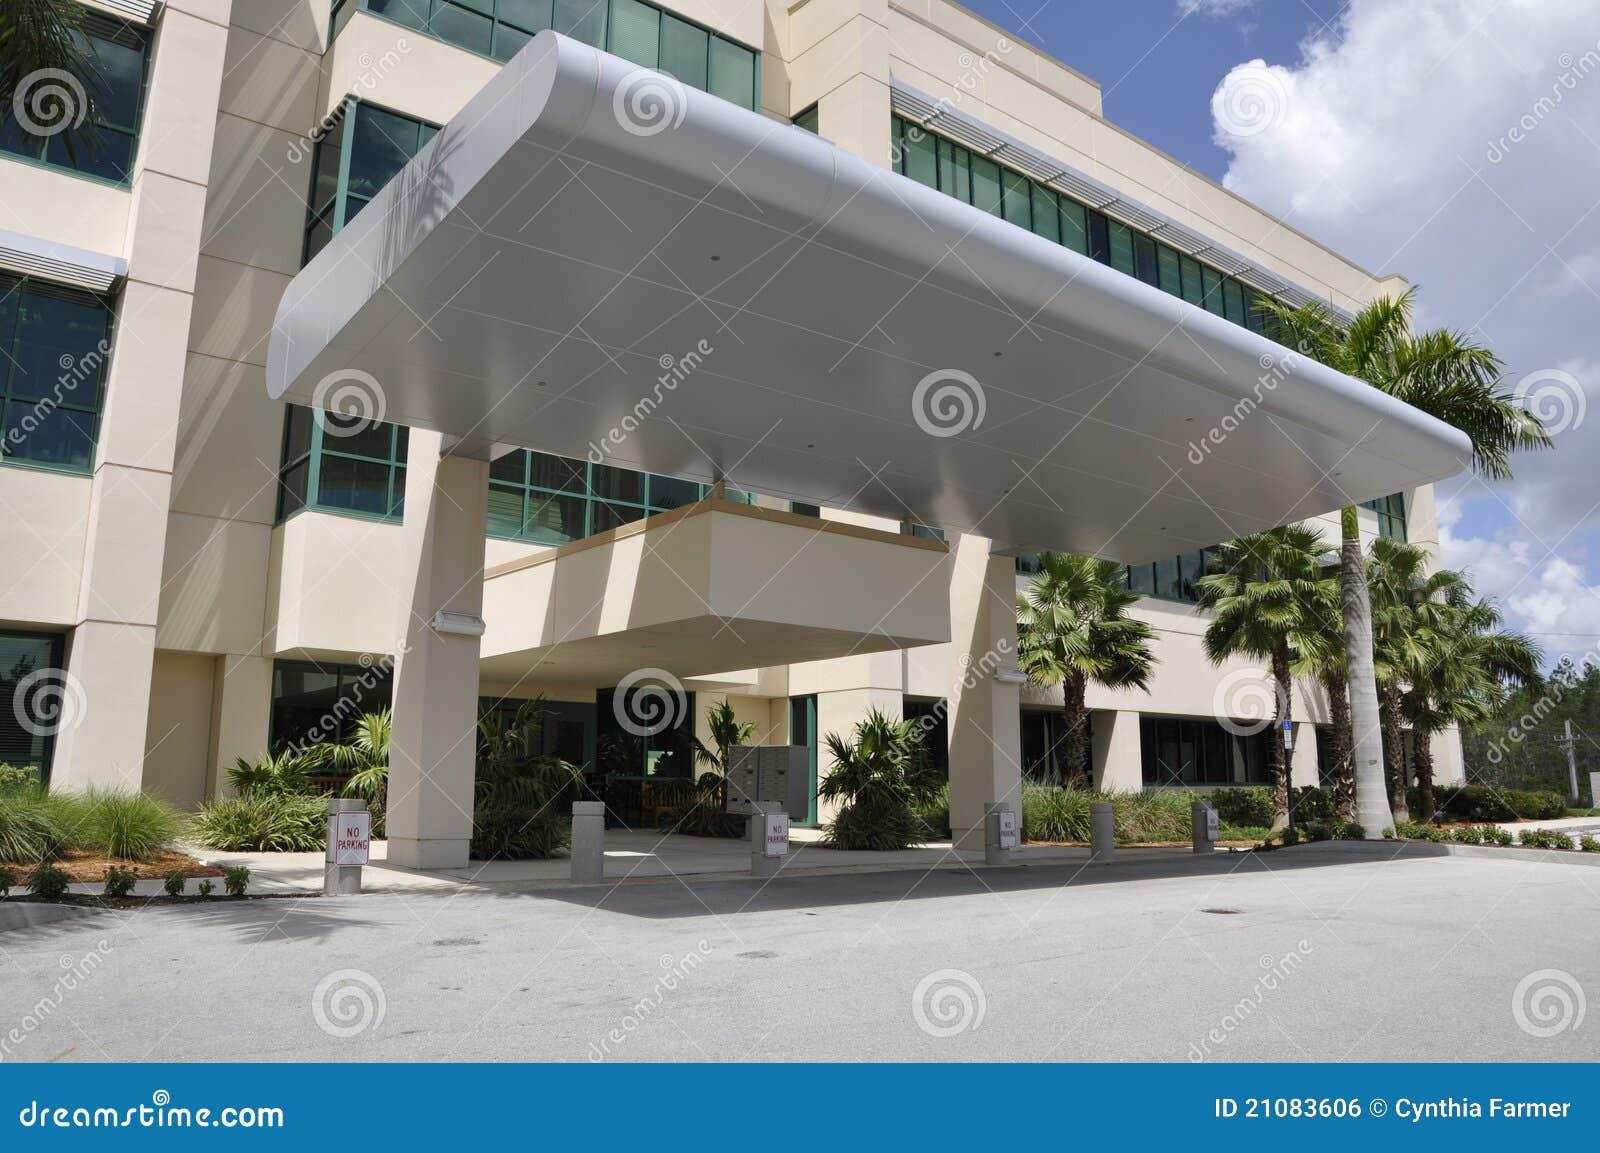 Classroom Design Themes ~ Modern hospital entrance royalty free stock image